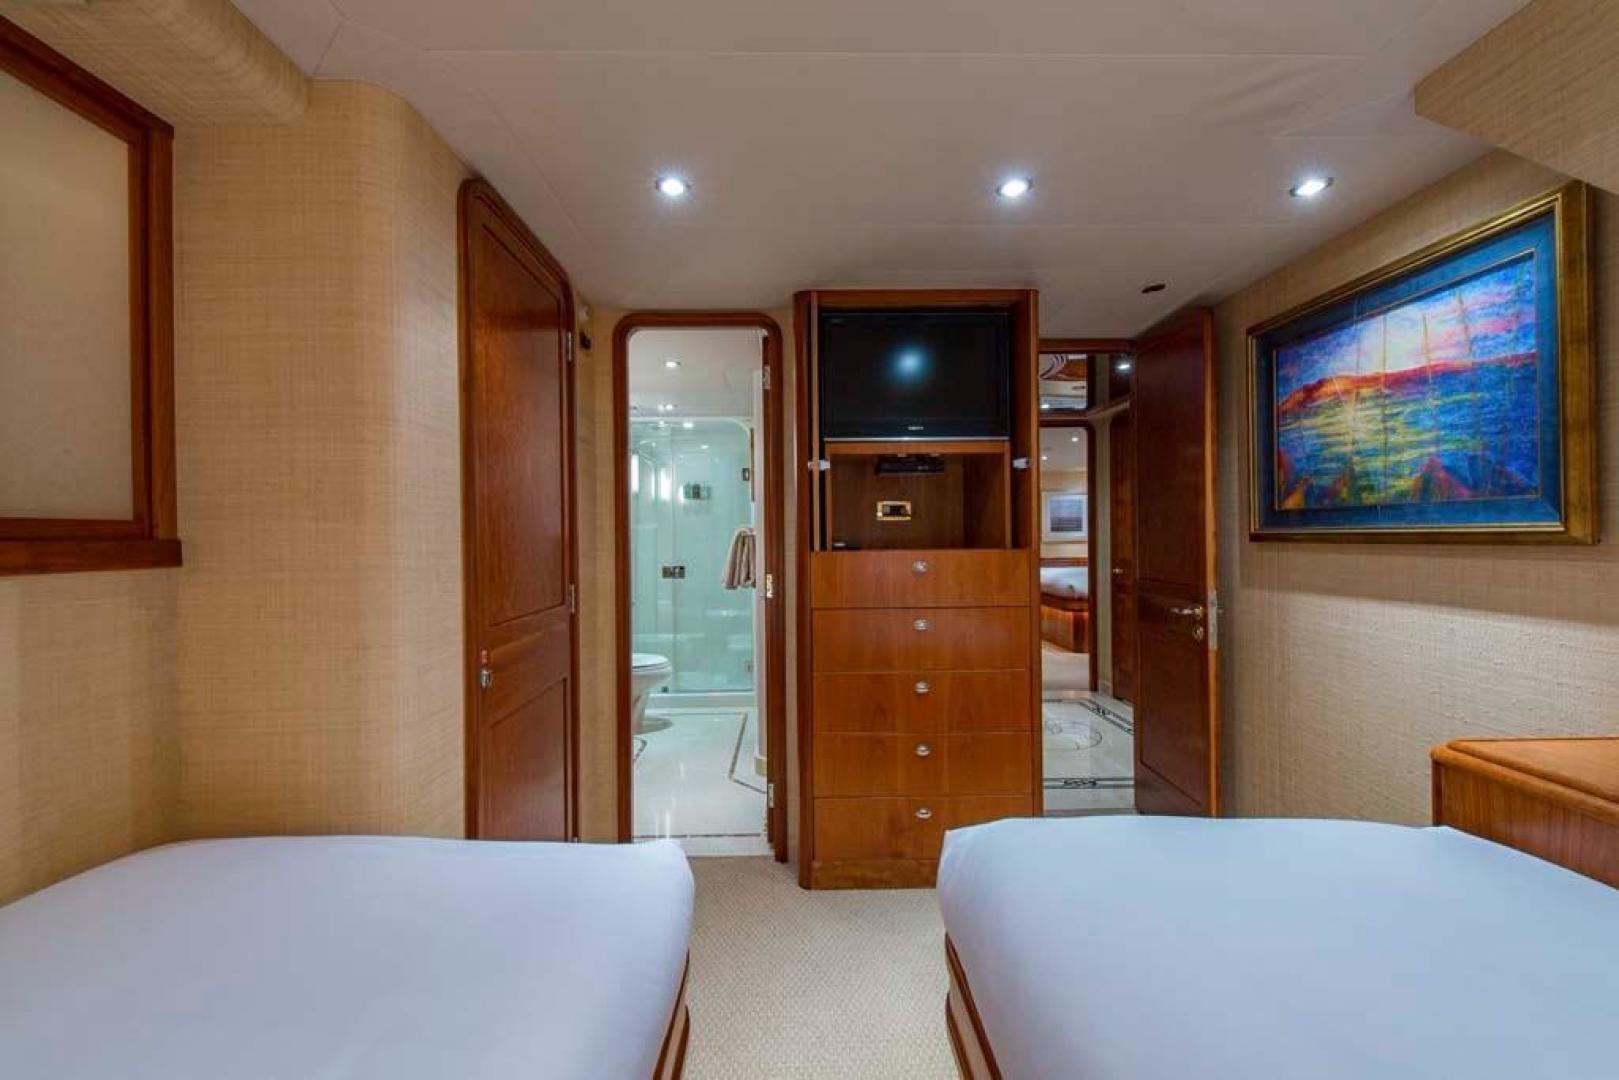 Westport-Tri-Deck 2003-Vision Jupiter-Florida-United States-Starboard Guest Statroom-370682 | Thumbnail